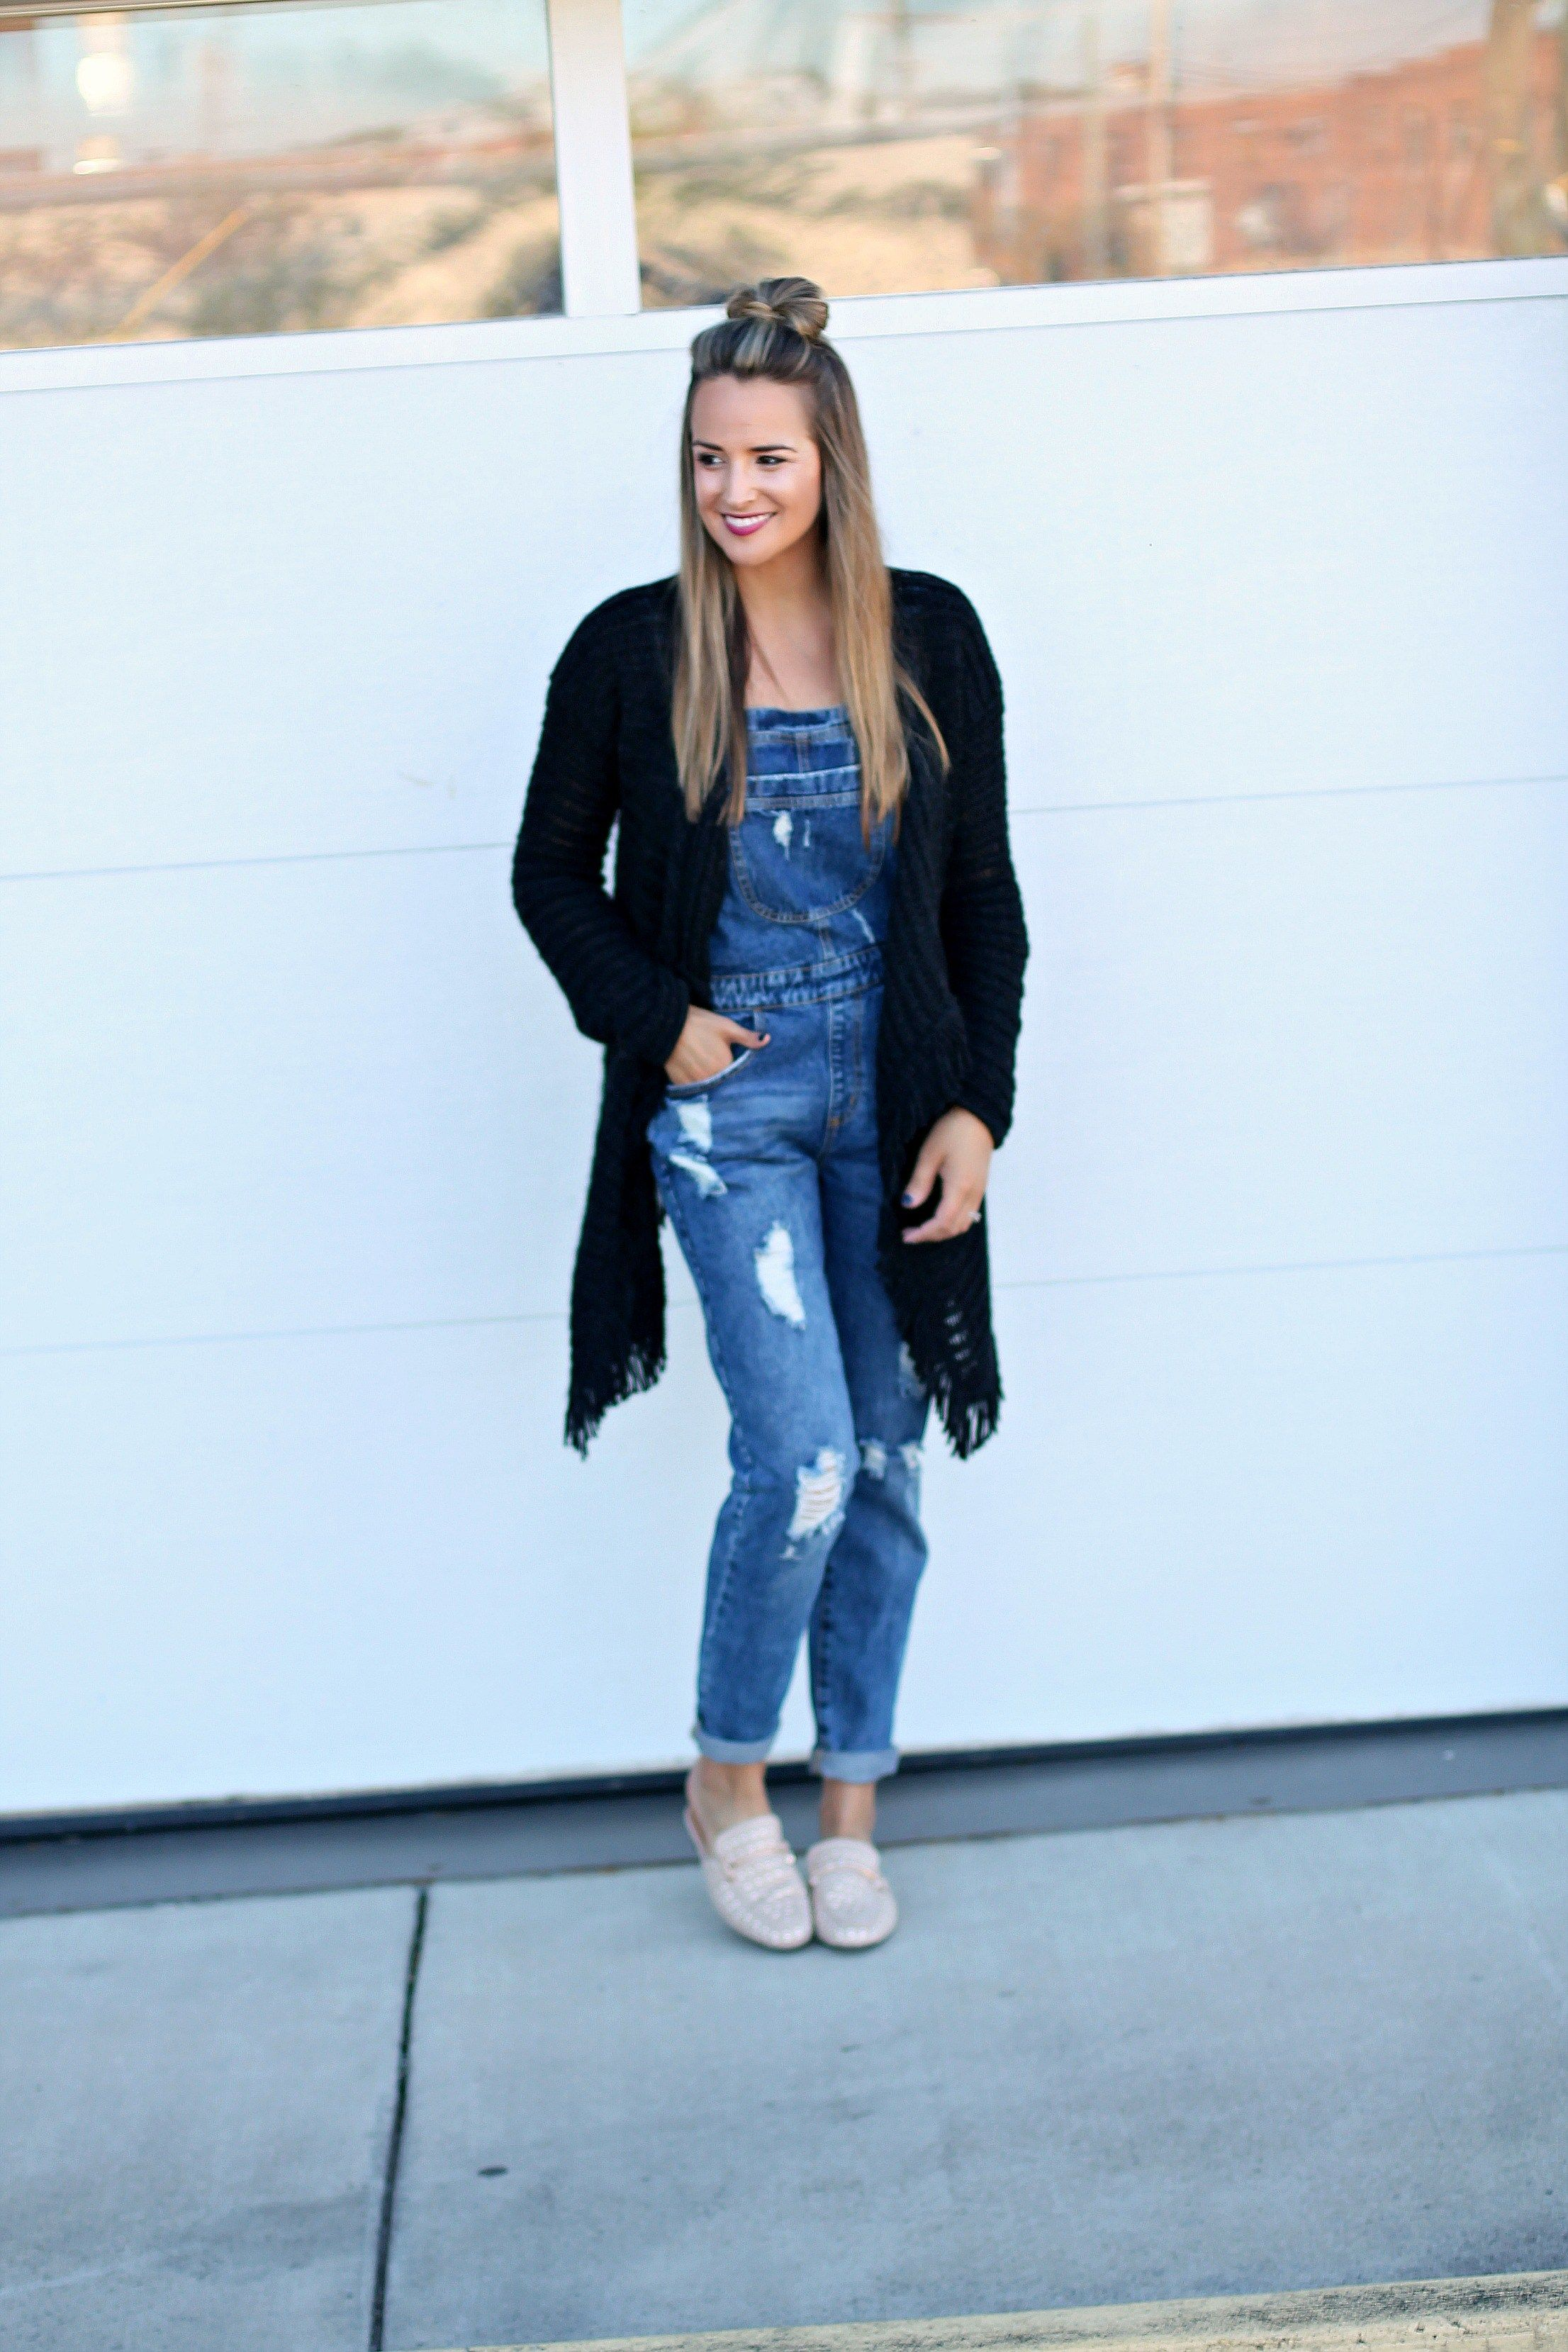 f320379dc3 Garnet Hill Sweater + Overalls  LexWhatWear  styleblog  style  fashion   ootd  outfitideas  styleinspiration  outfidguide  fallfashion  fallstyle    ...